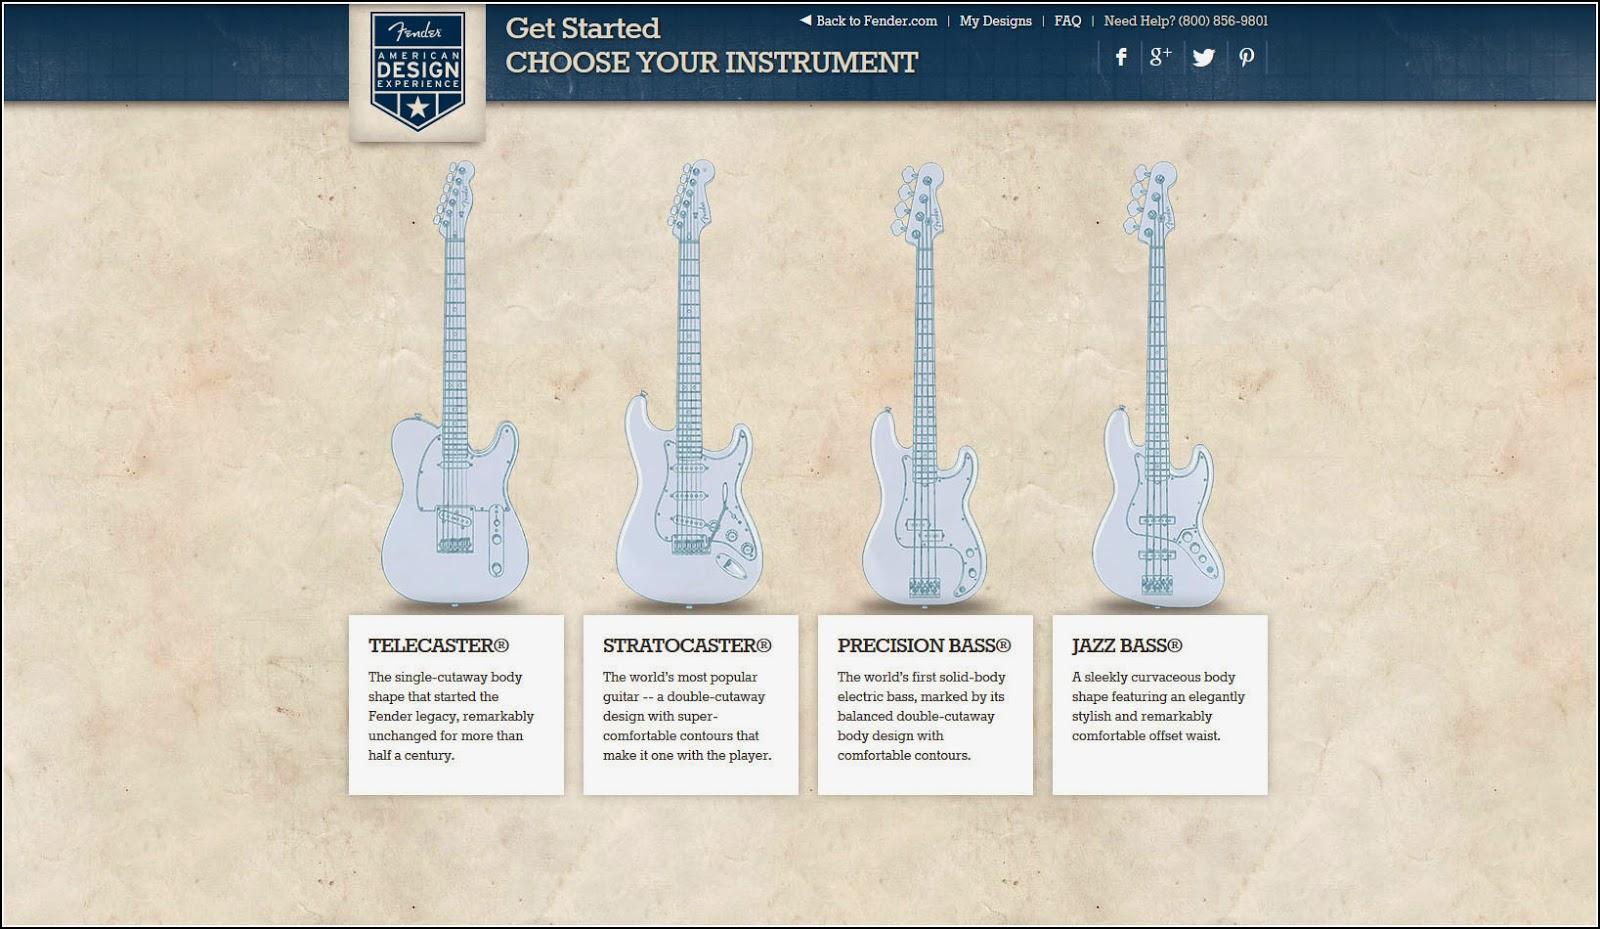 http://www.fender.com/en-BR/american-design/instruments/